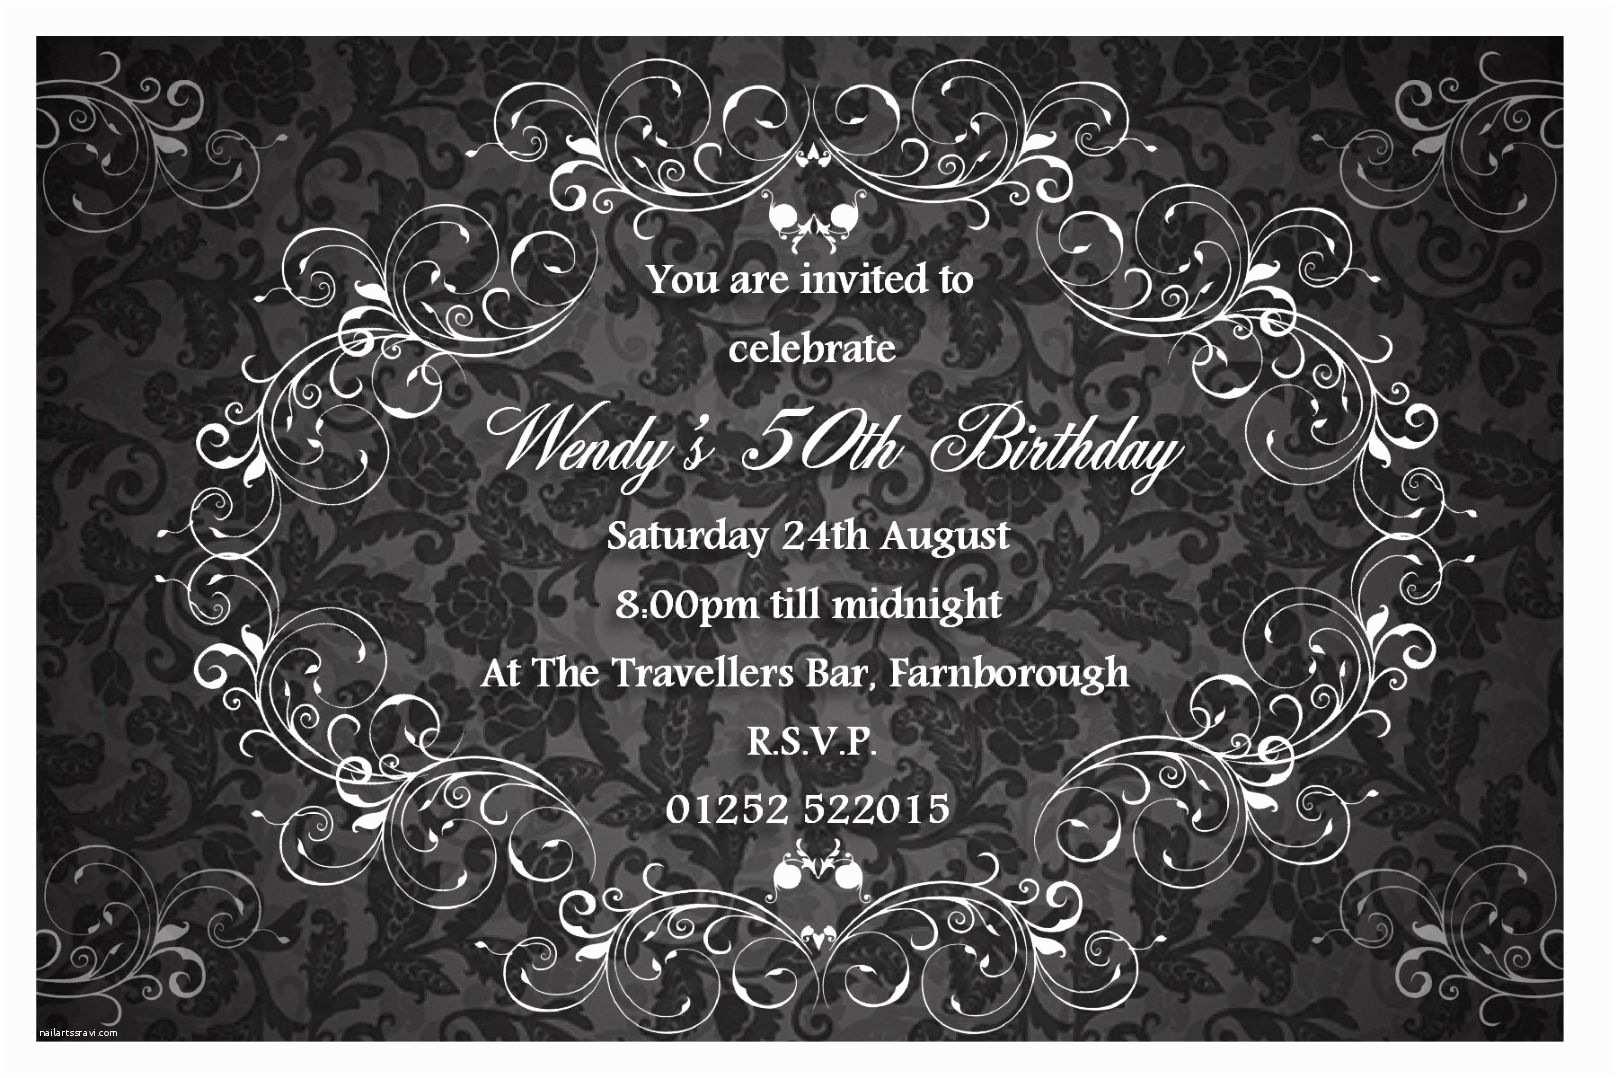 Elegant Party Invitations How to Make Elegant Birthday Invitations Ideas Charming